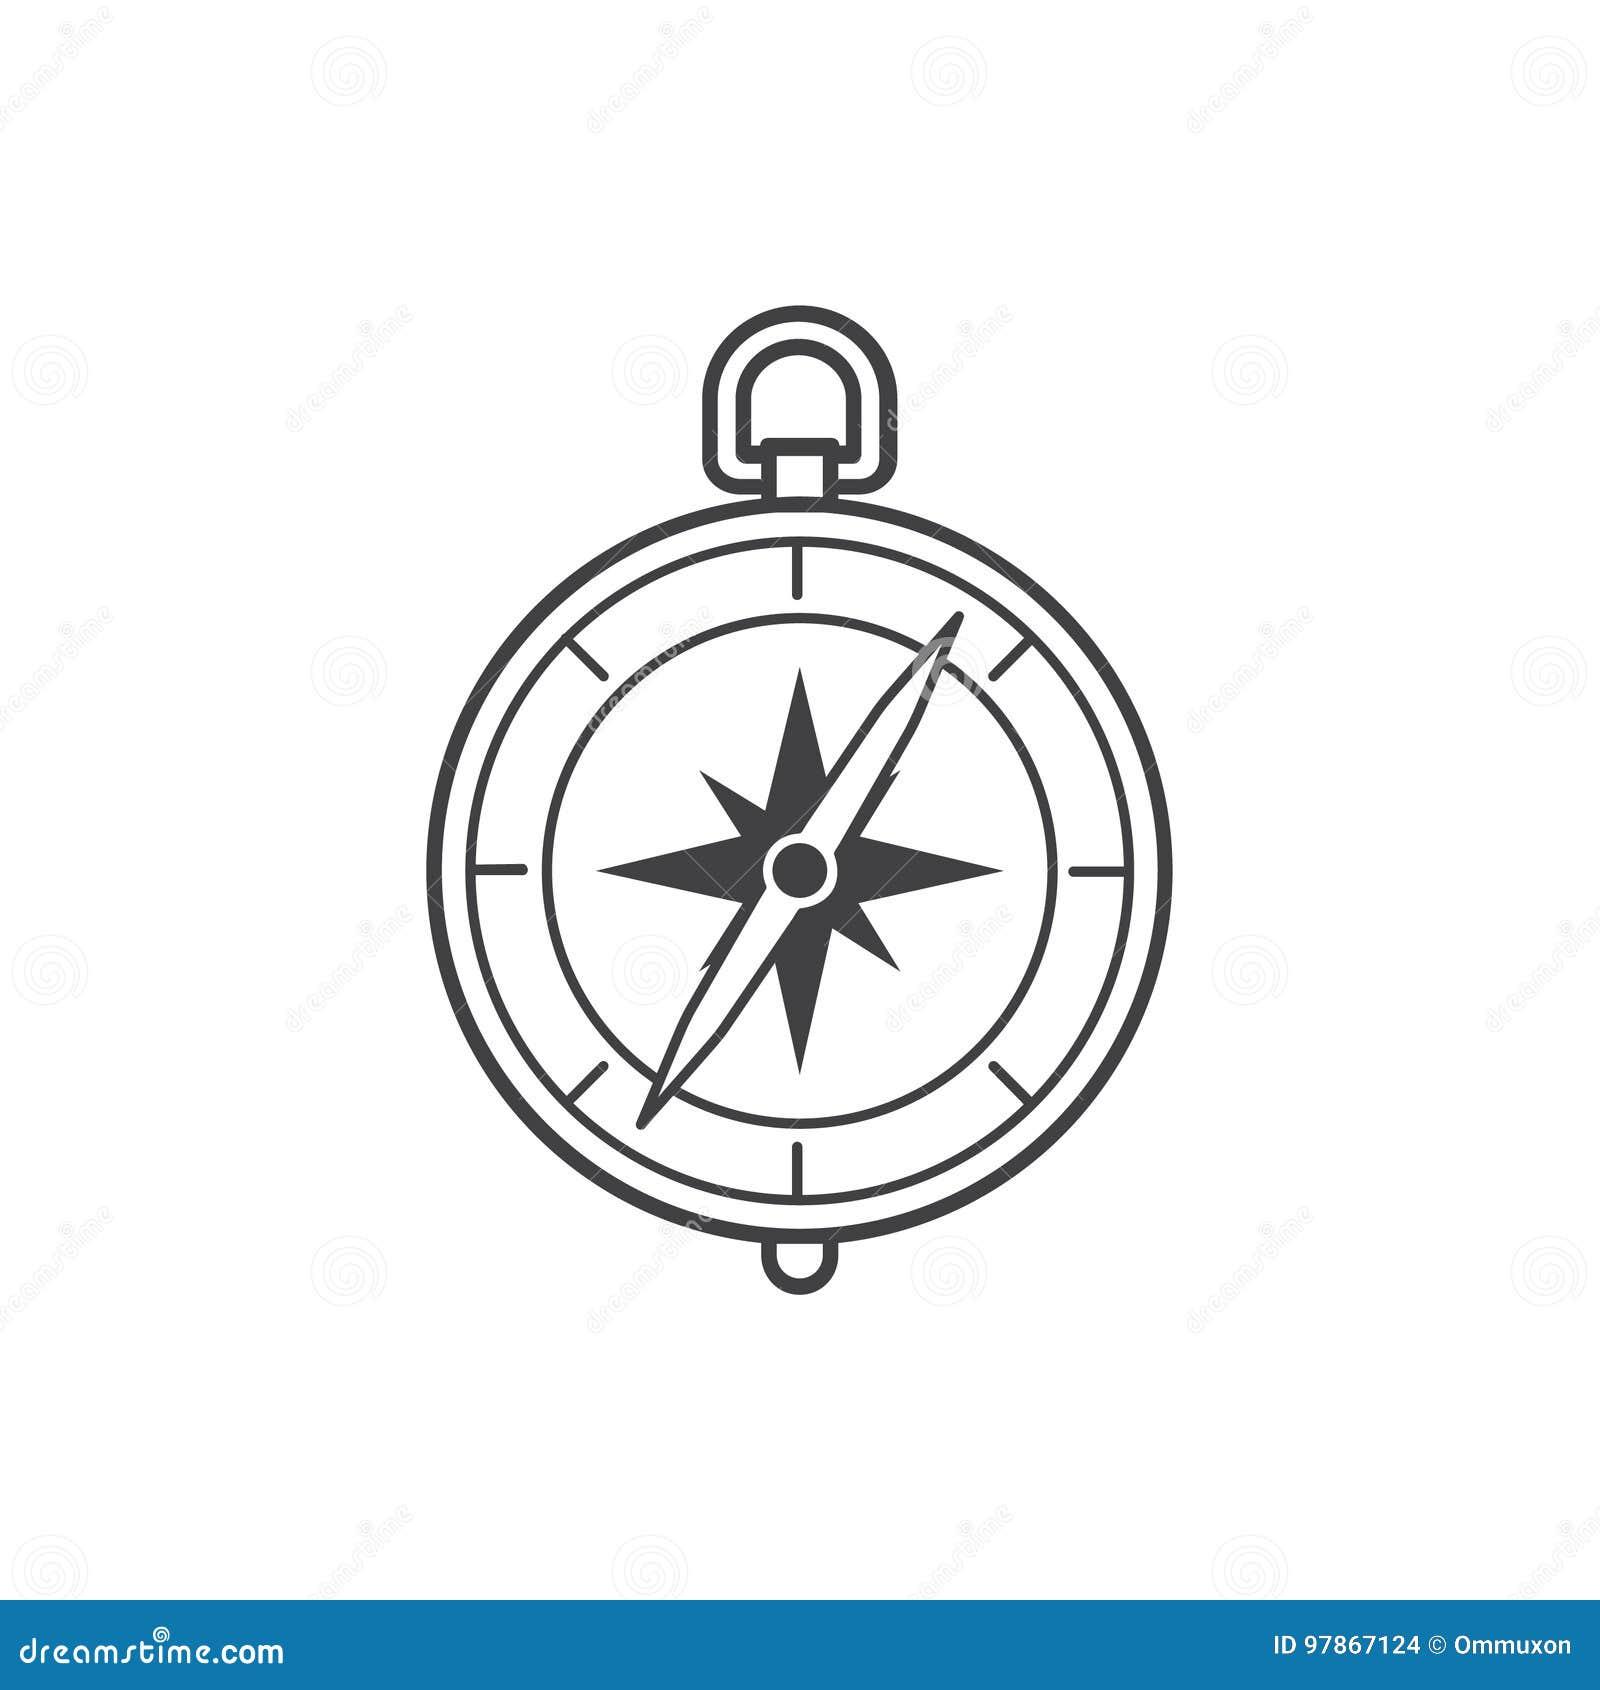 Compass Icon Stock Vector Illustration Of Adventure 97867124